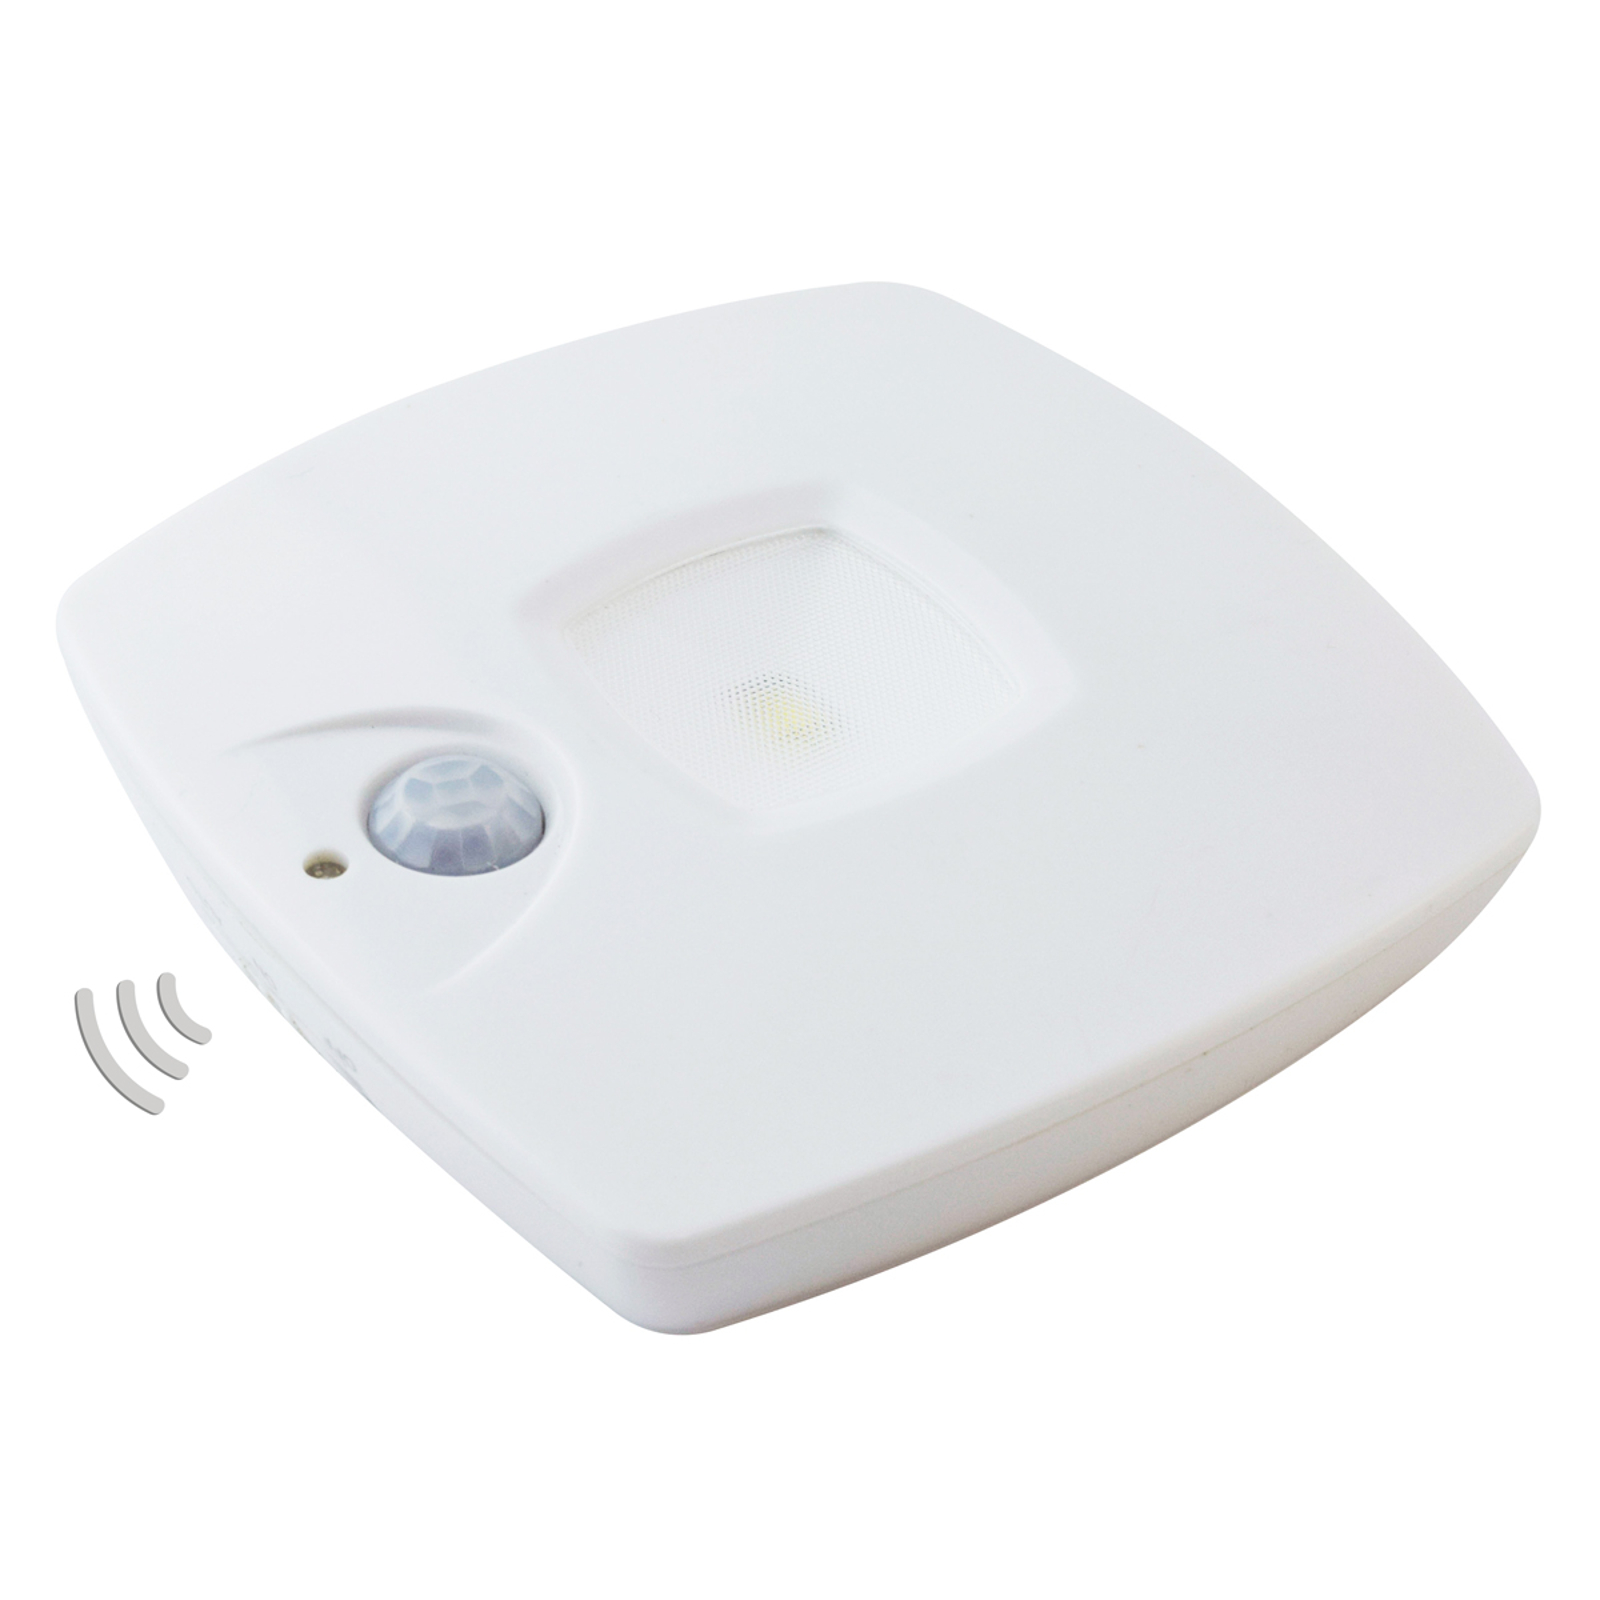 Paristokäyttöinen LED-yövalo Nightlight Sensor